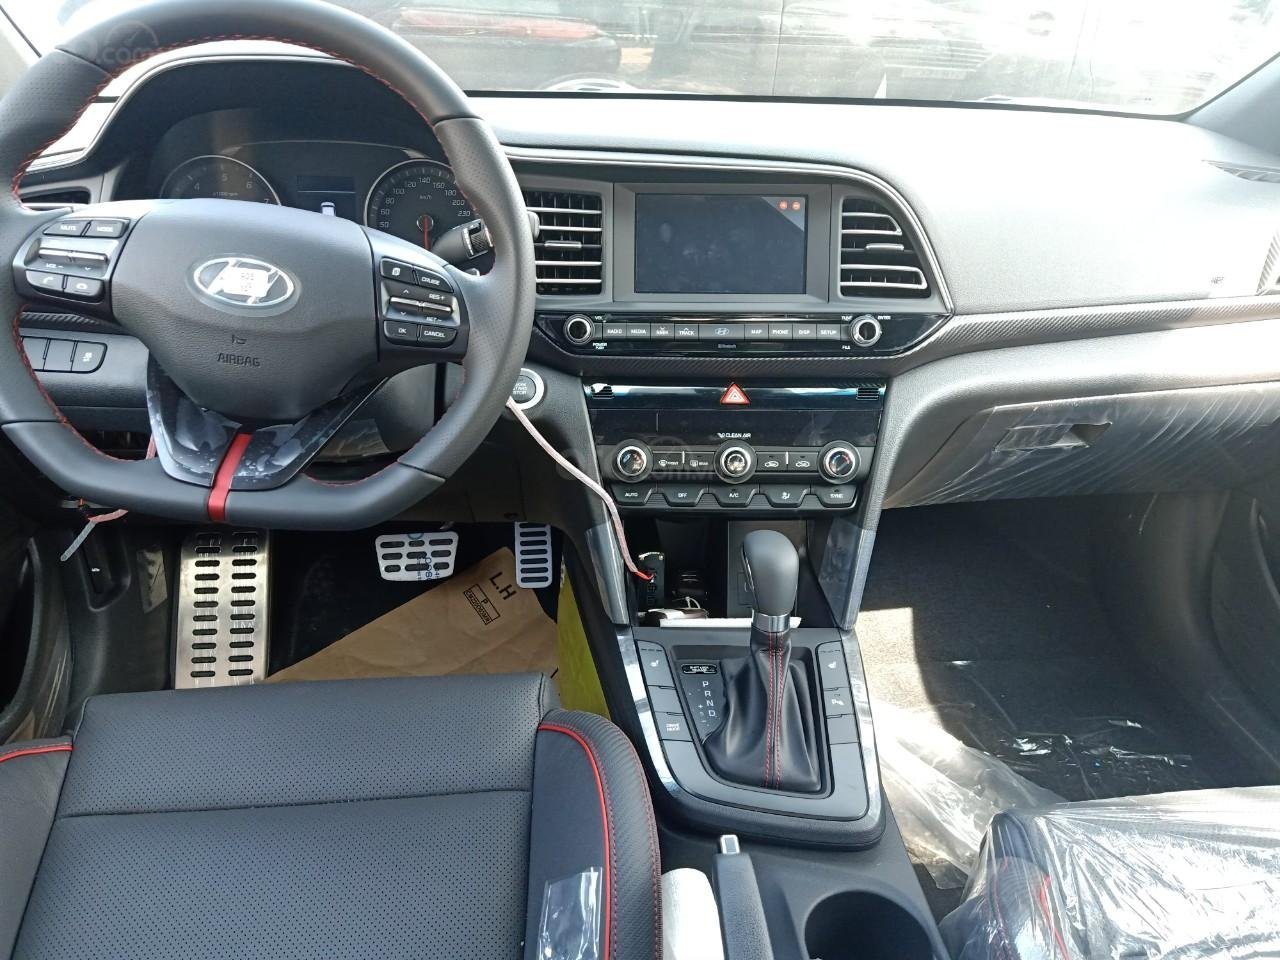 Hyundai Elantra 1.6AT Sport đỏ+ Sale sốc KM 40 triệu+ xe giao ngay (9)